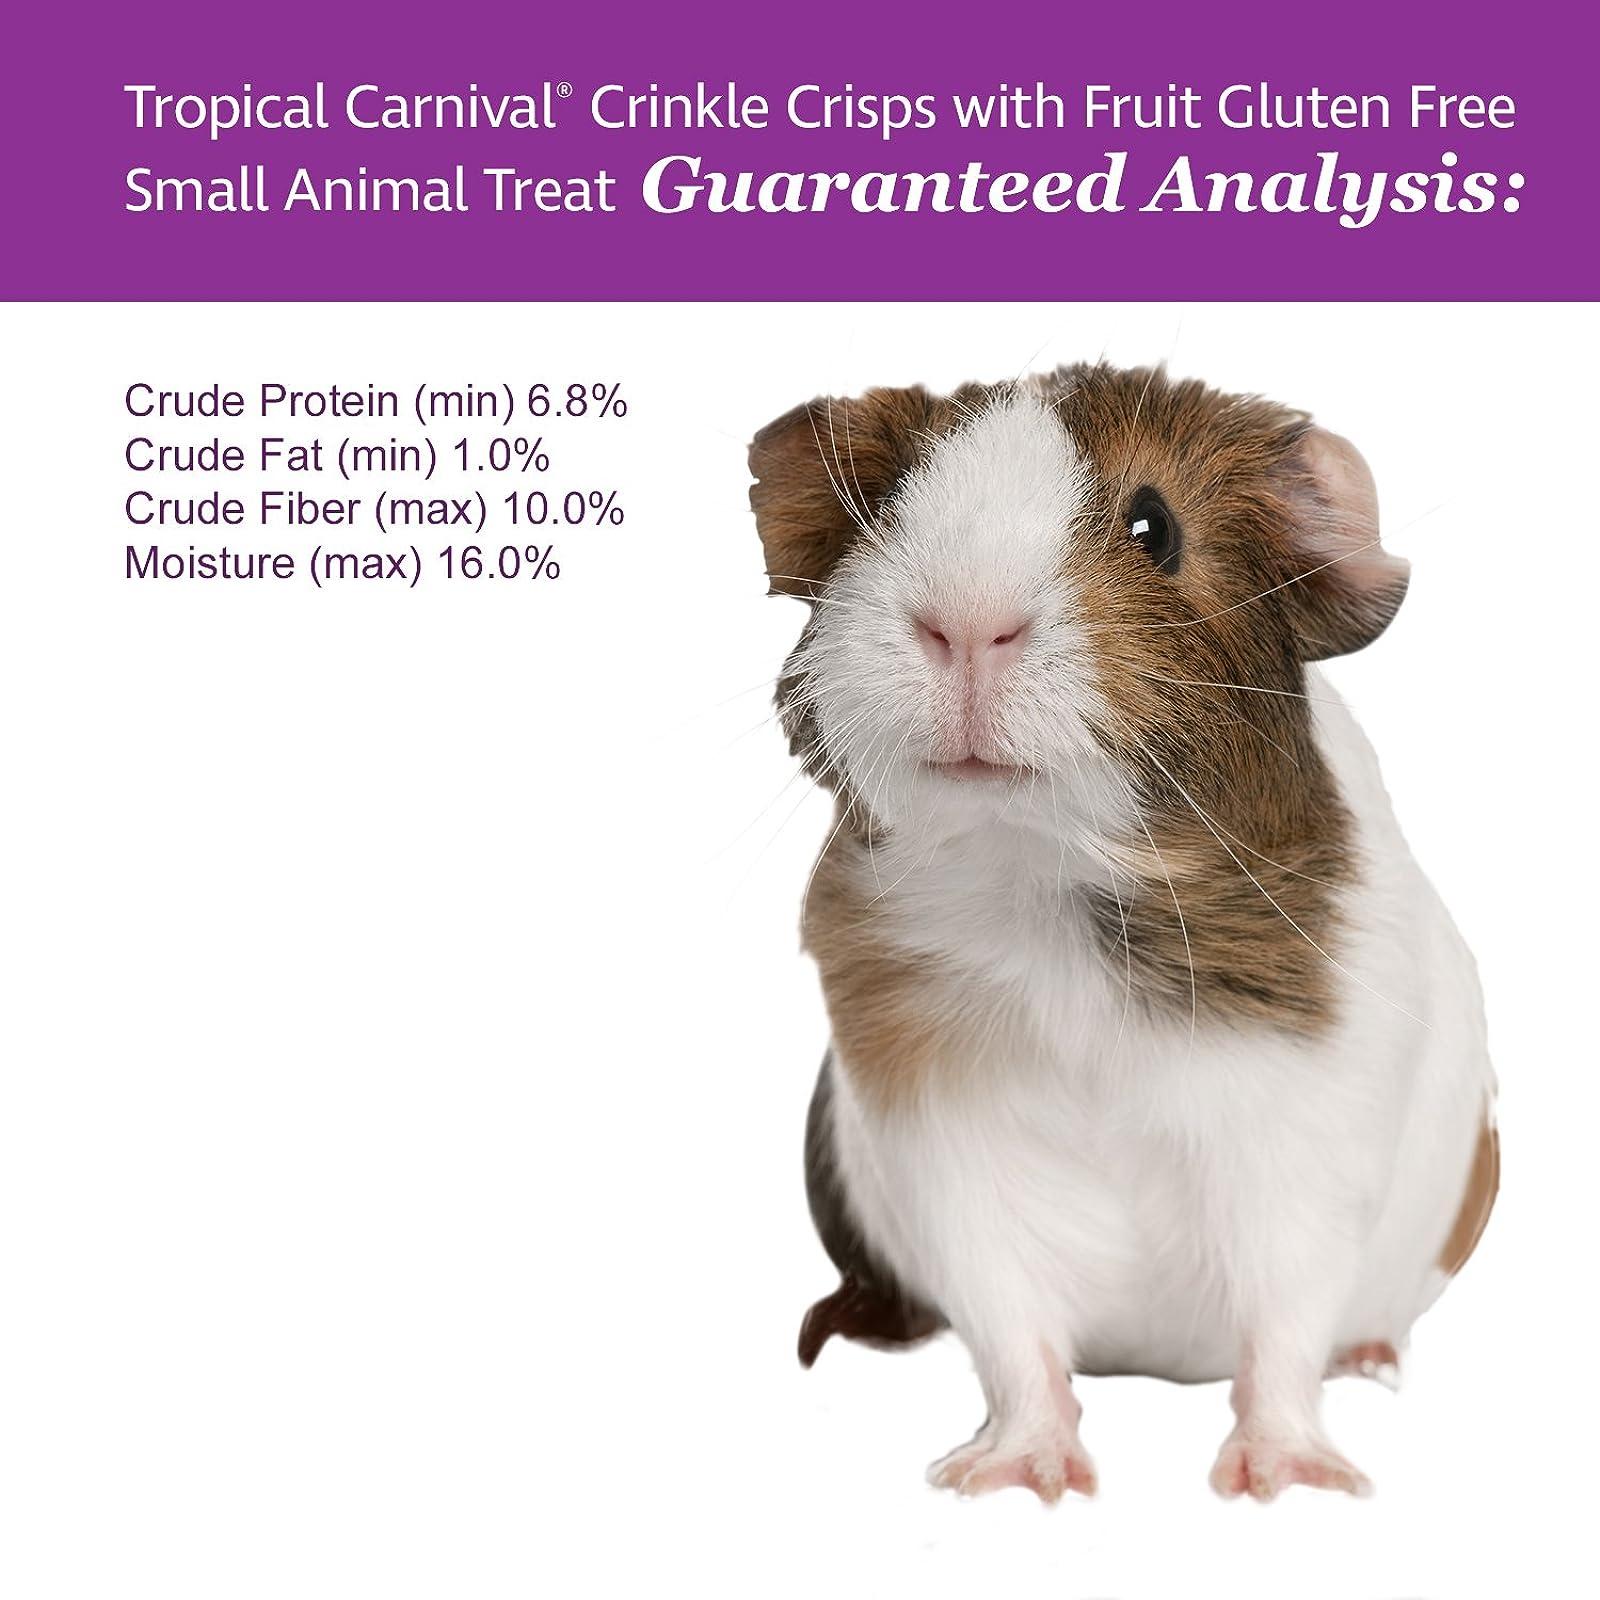 Tropical Carnival F.M. Brown's Crinkle 44943 - 4